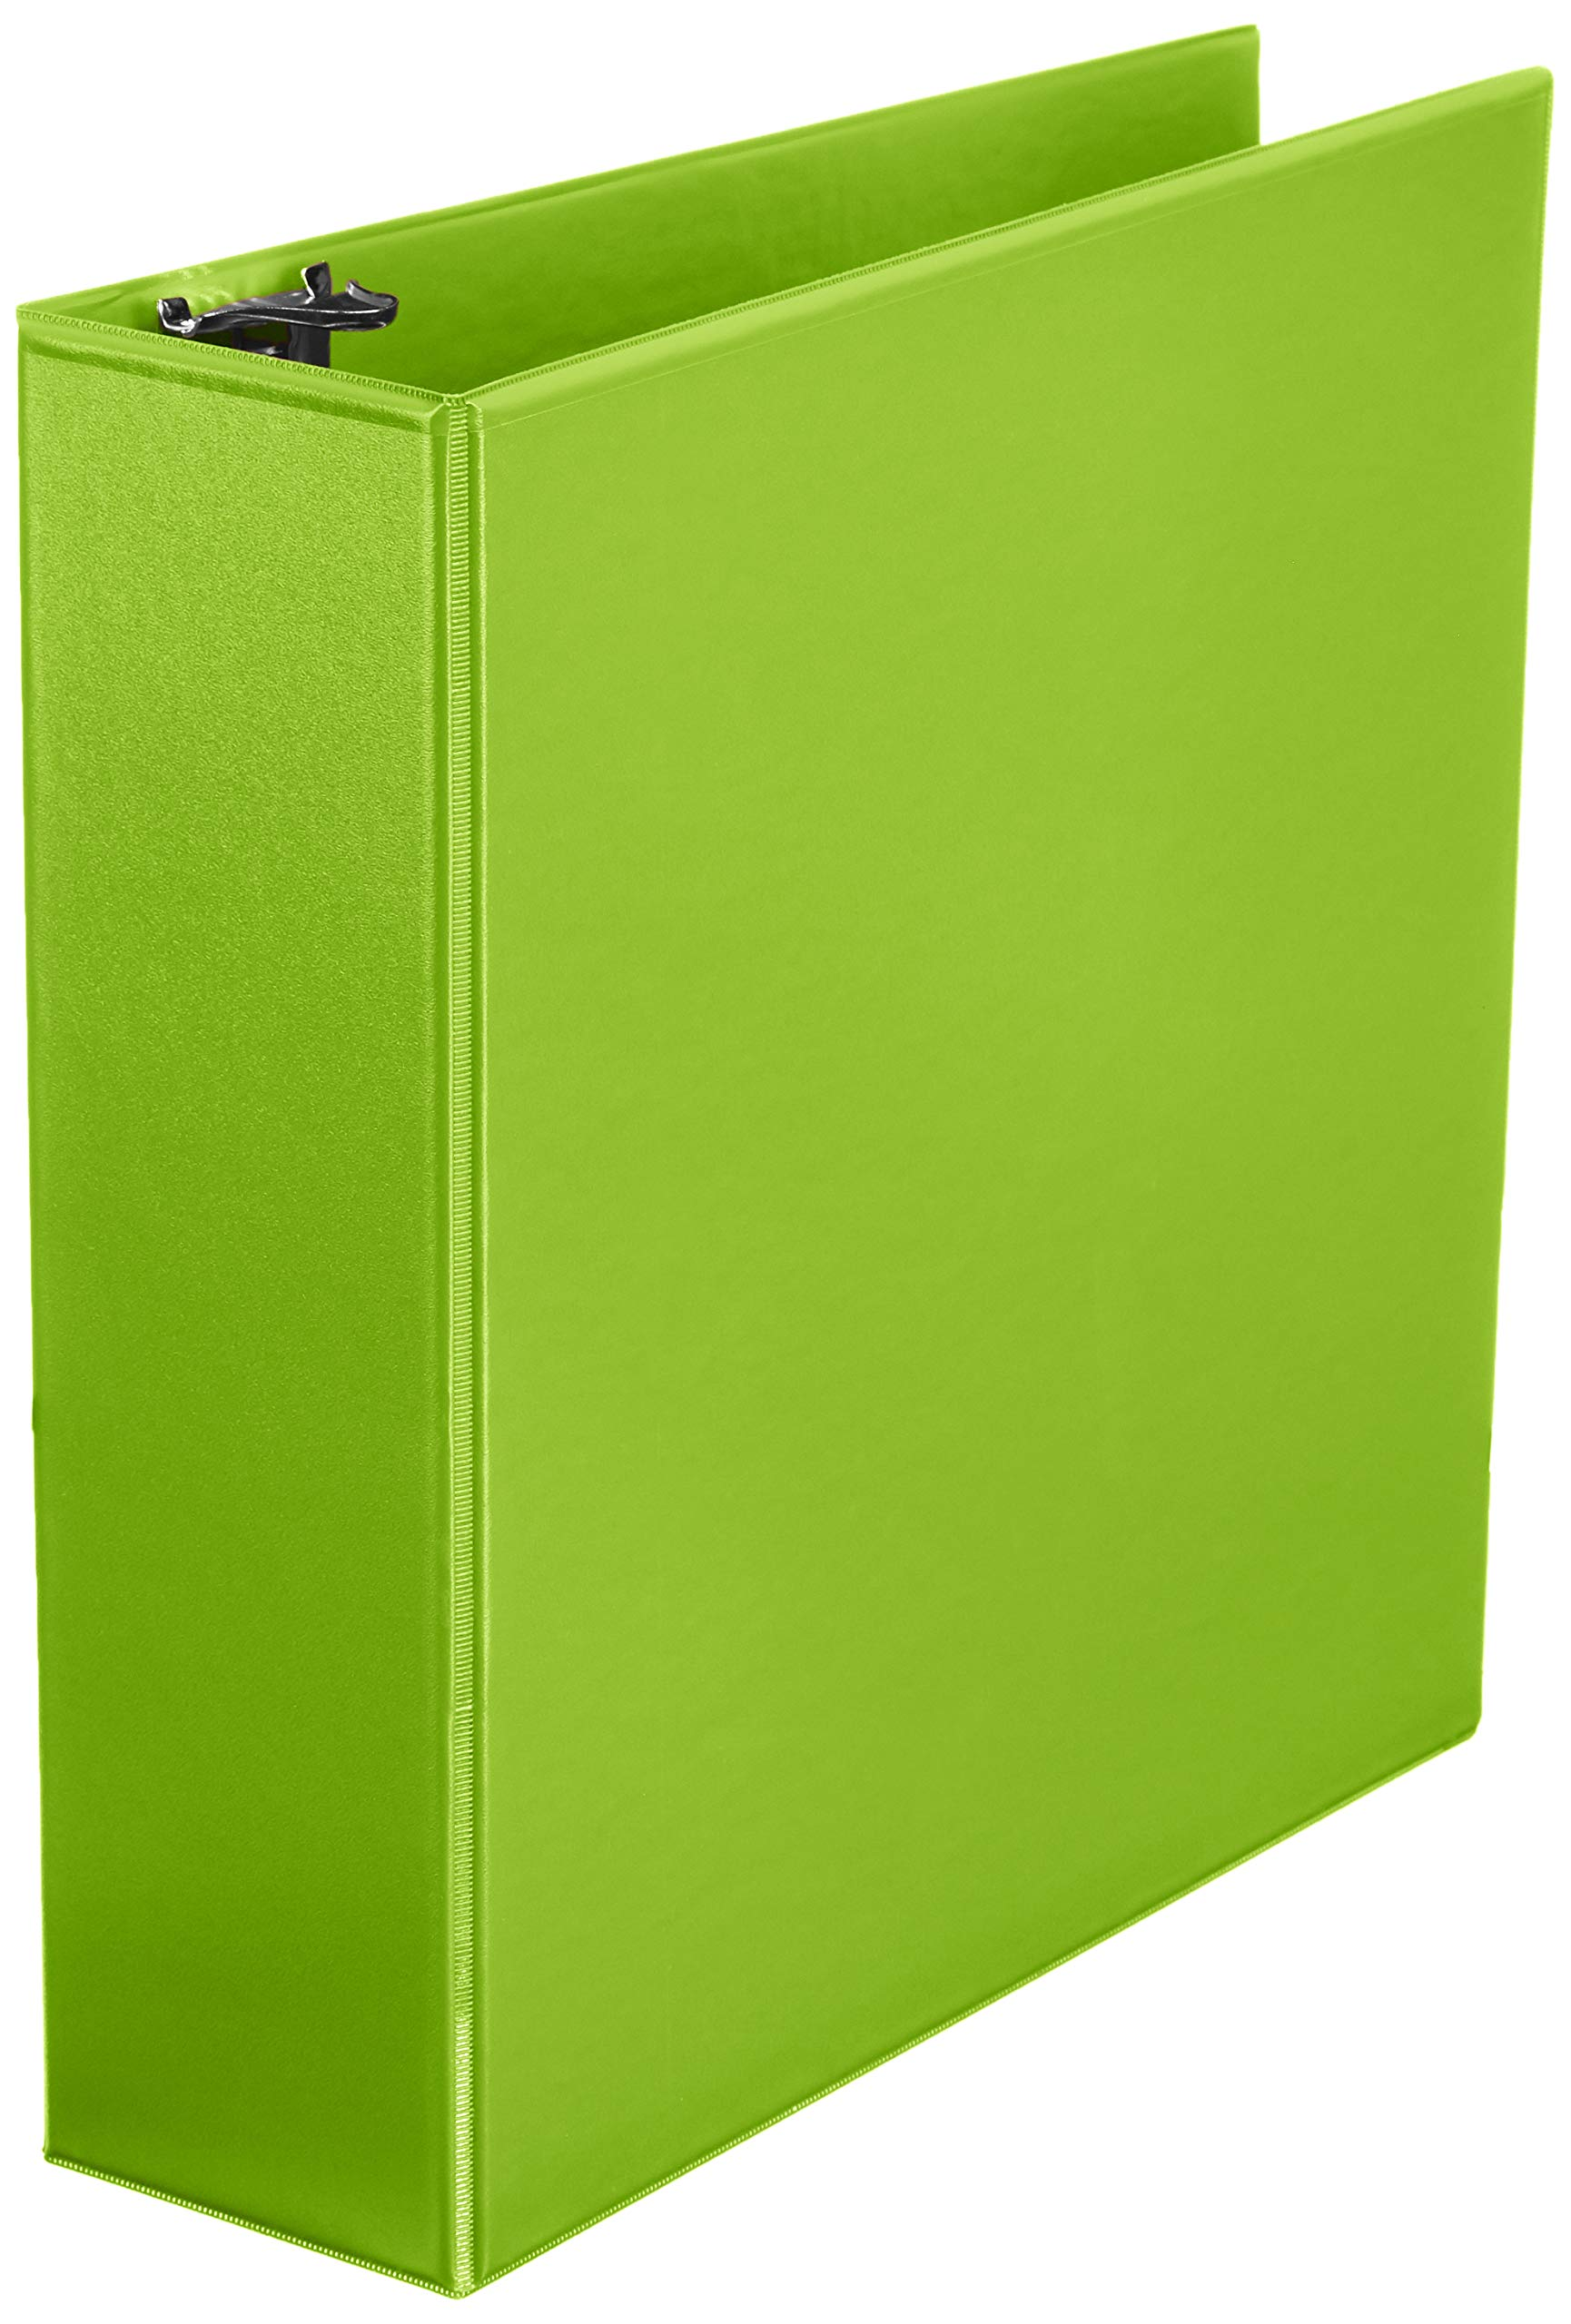 AmazonBasics 3-Inch Round Ring Binder, Green, View, 4-Pack